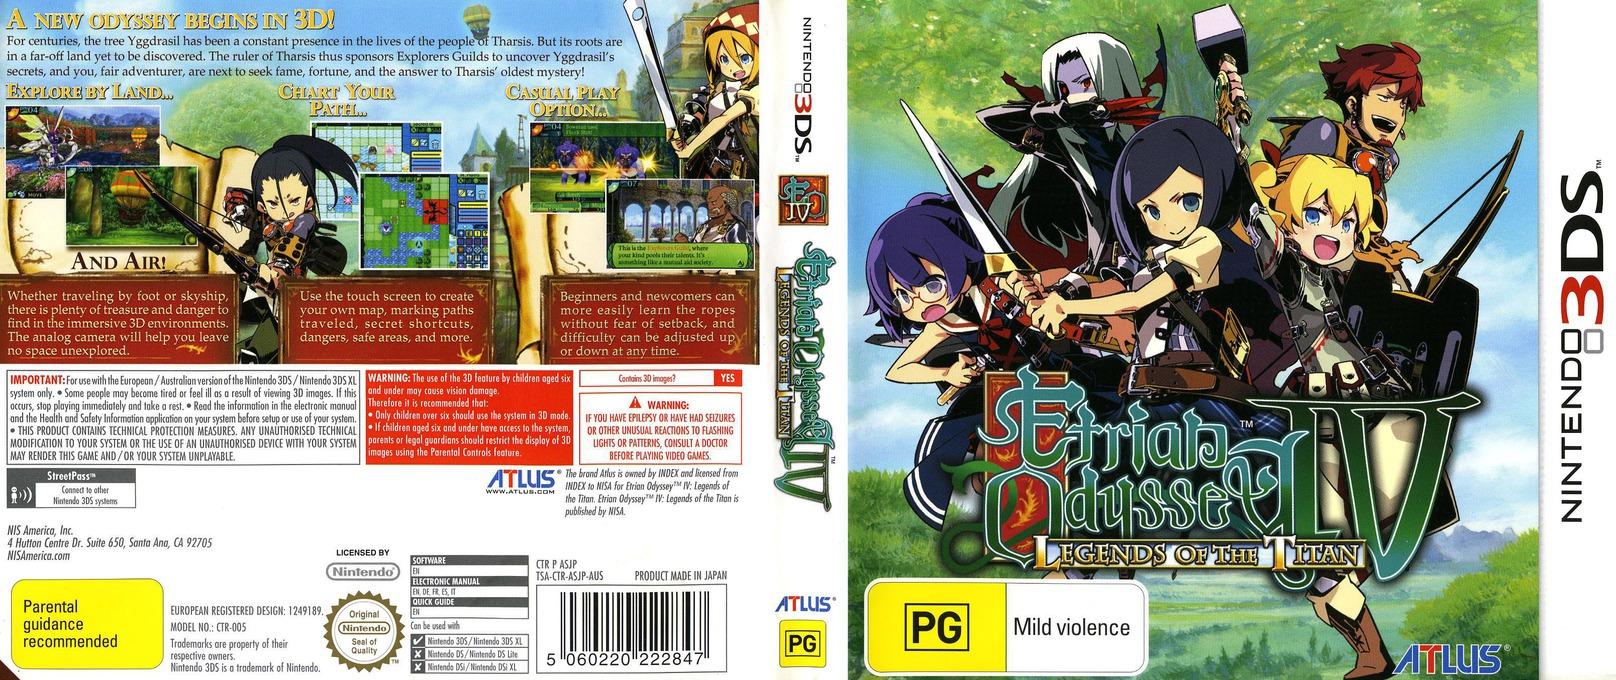 Etrian Odyssey IV - Legends of the Titan 3DS coverfullHQ (ASJP)